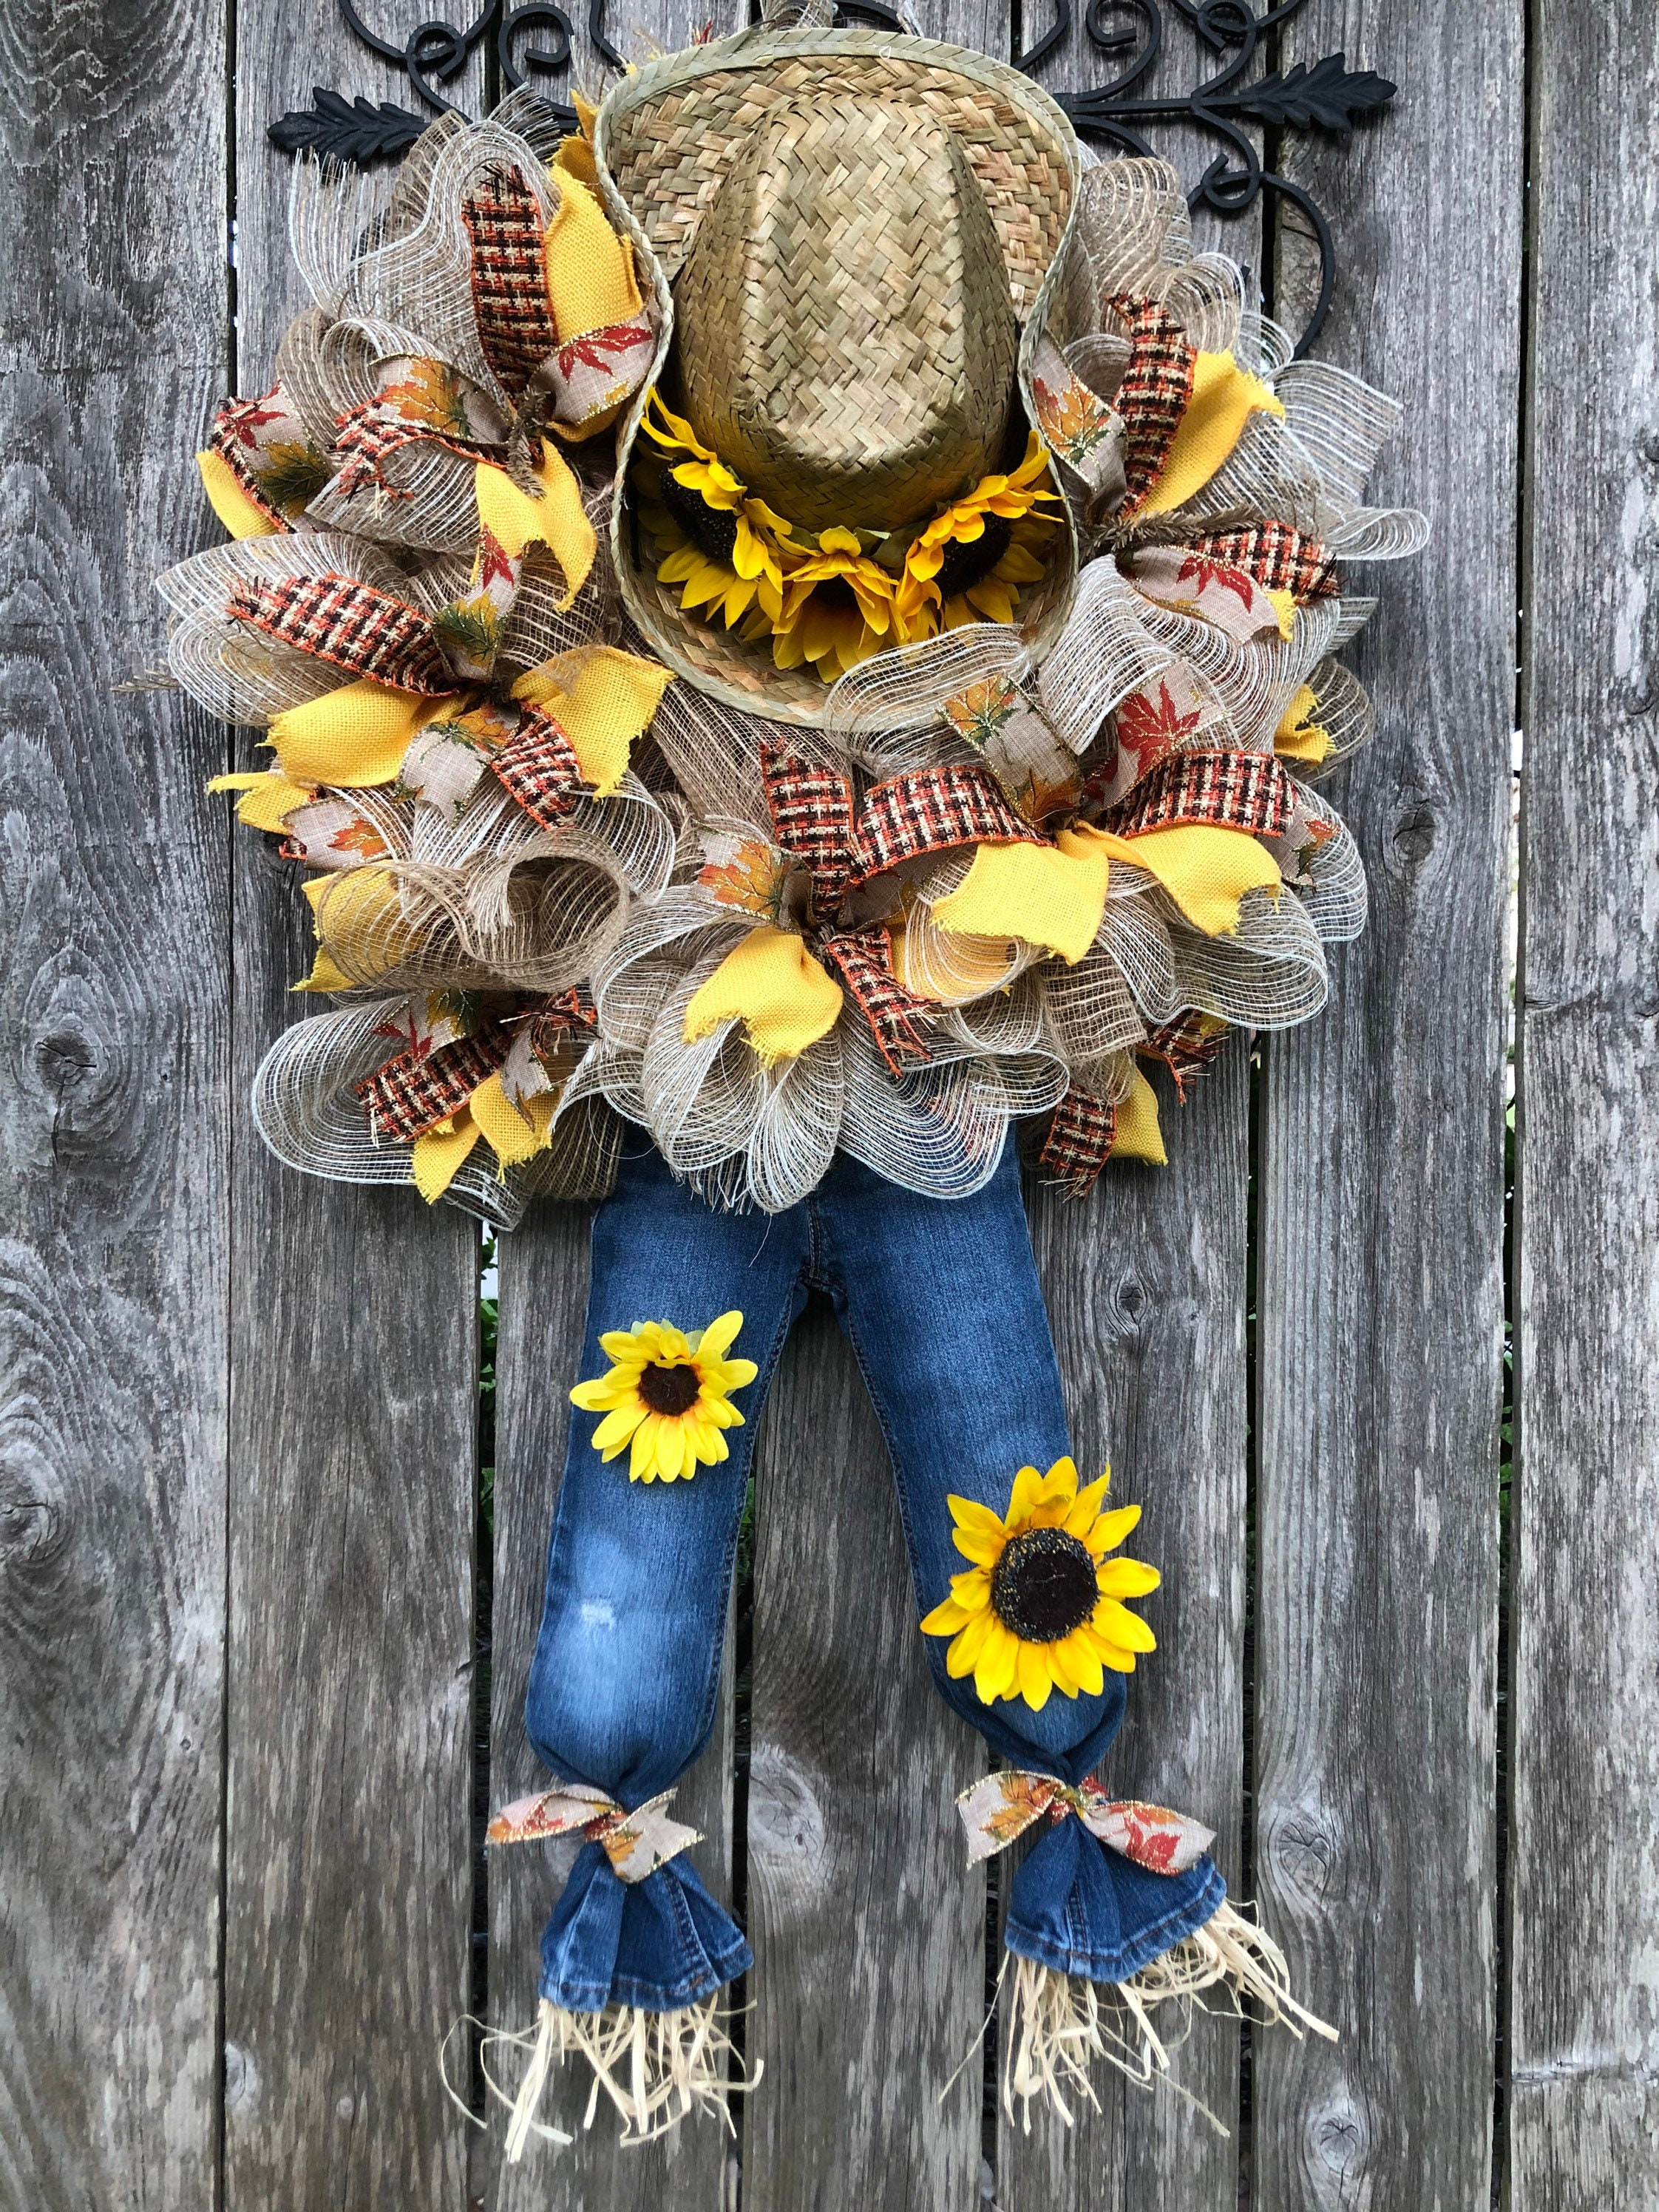 Cowboy Scarecrow Mesh Wreath Cowboy Hat And Jeans Scarecrow Wreath Scarecrow Sunflower Mesh Wreath Fall Wreath Scarecrow Decor